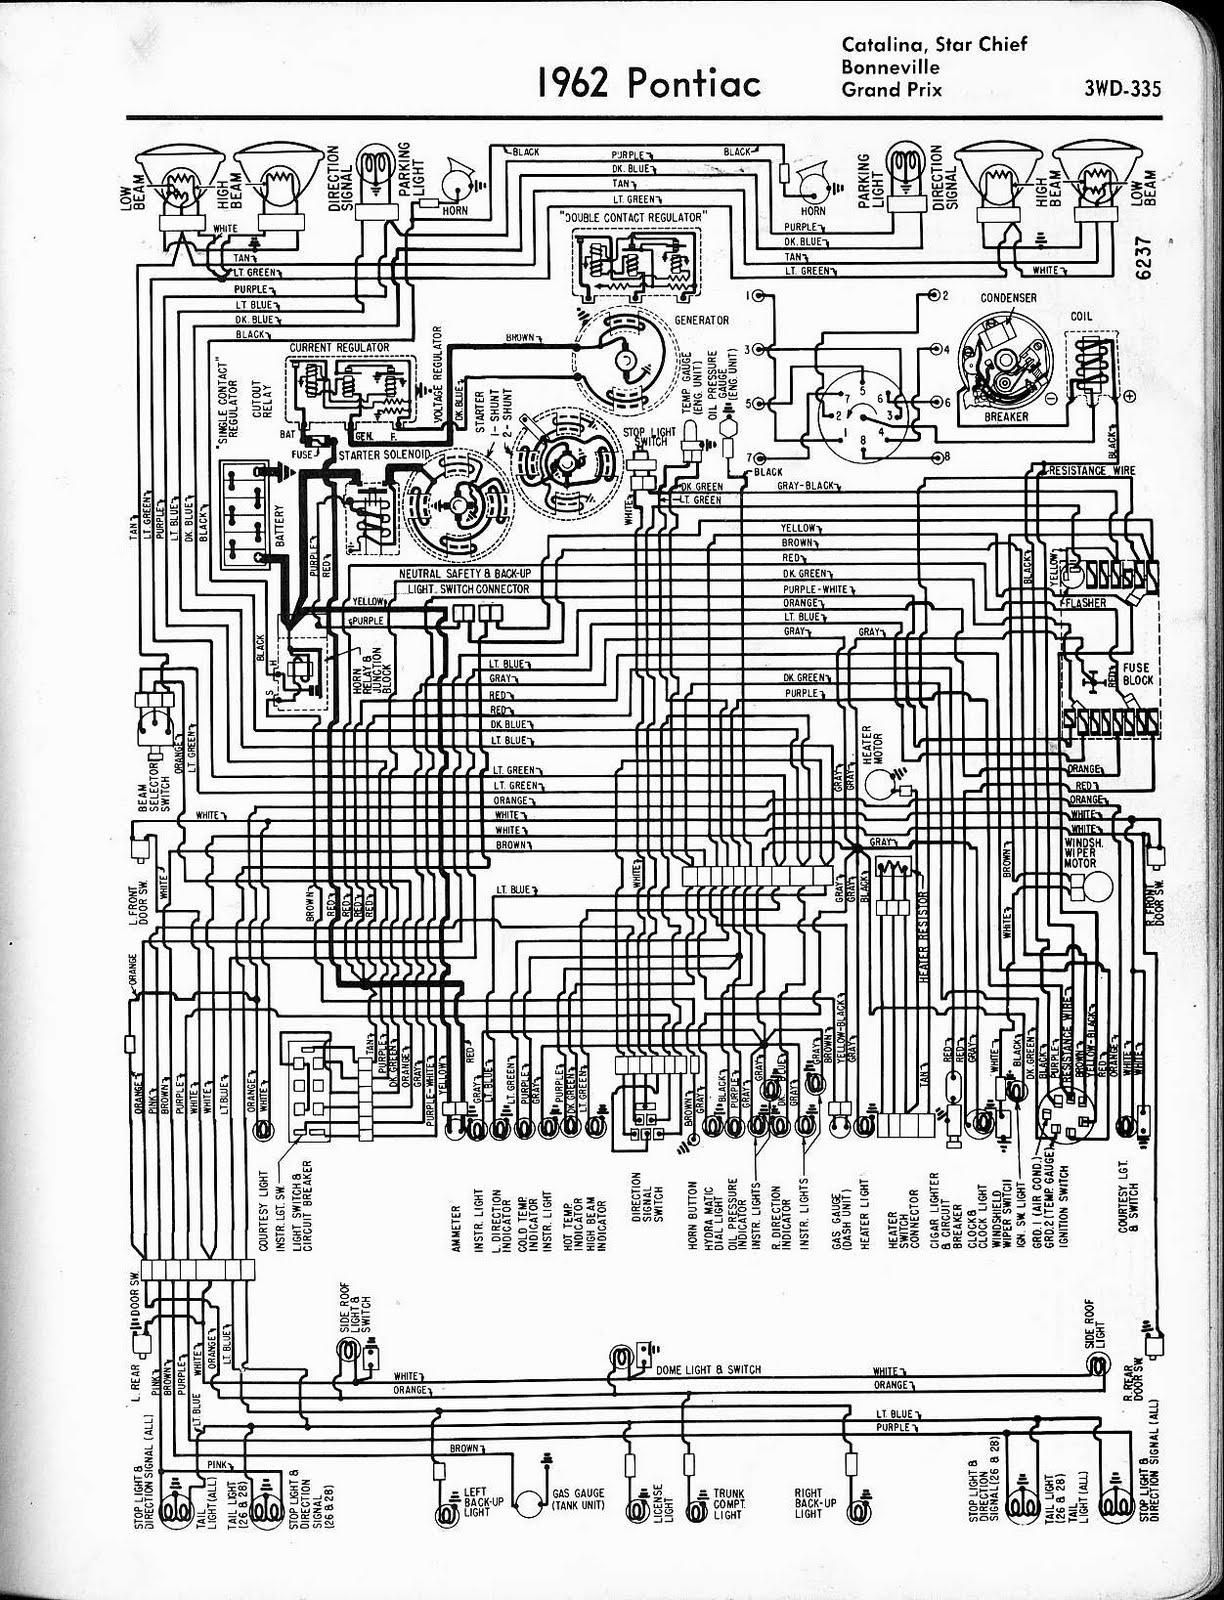 2000 Pontiac Grand Prix Gtp Radio Wiring Diagram Single Phase To 3 Motor Free Auto 1962 Catalina Star